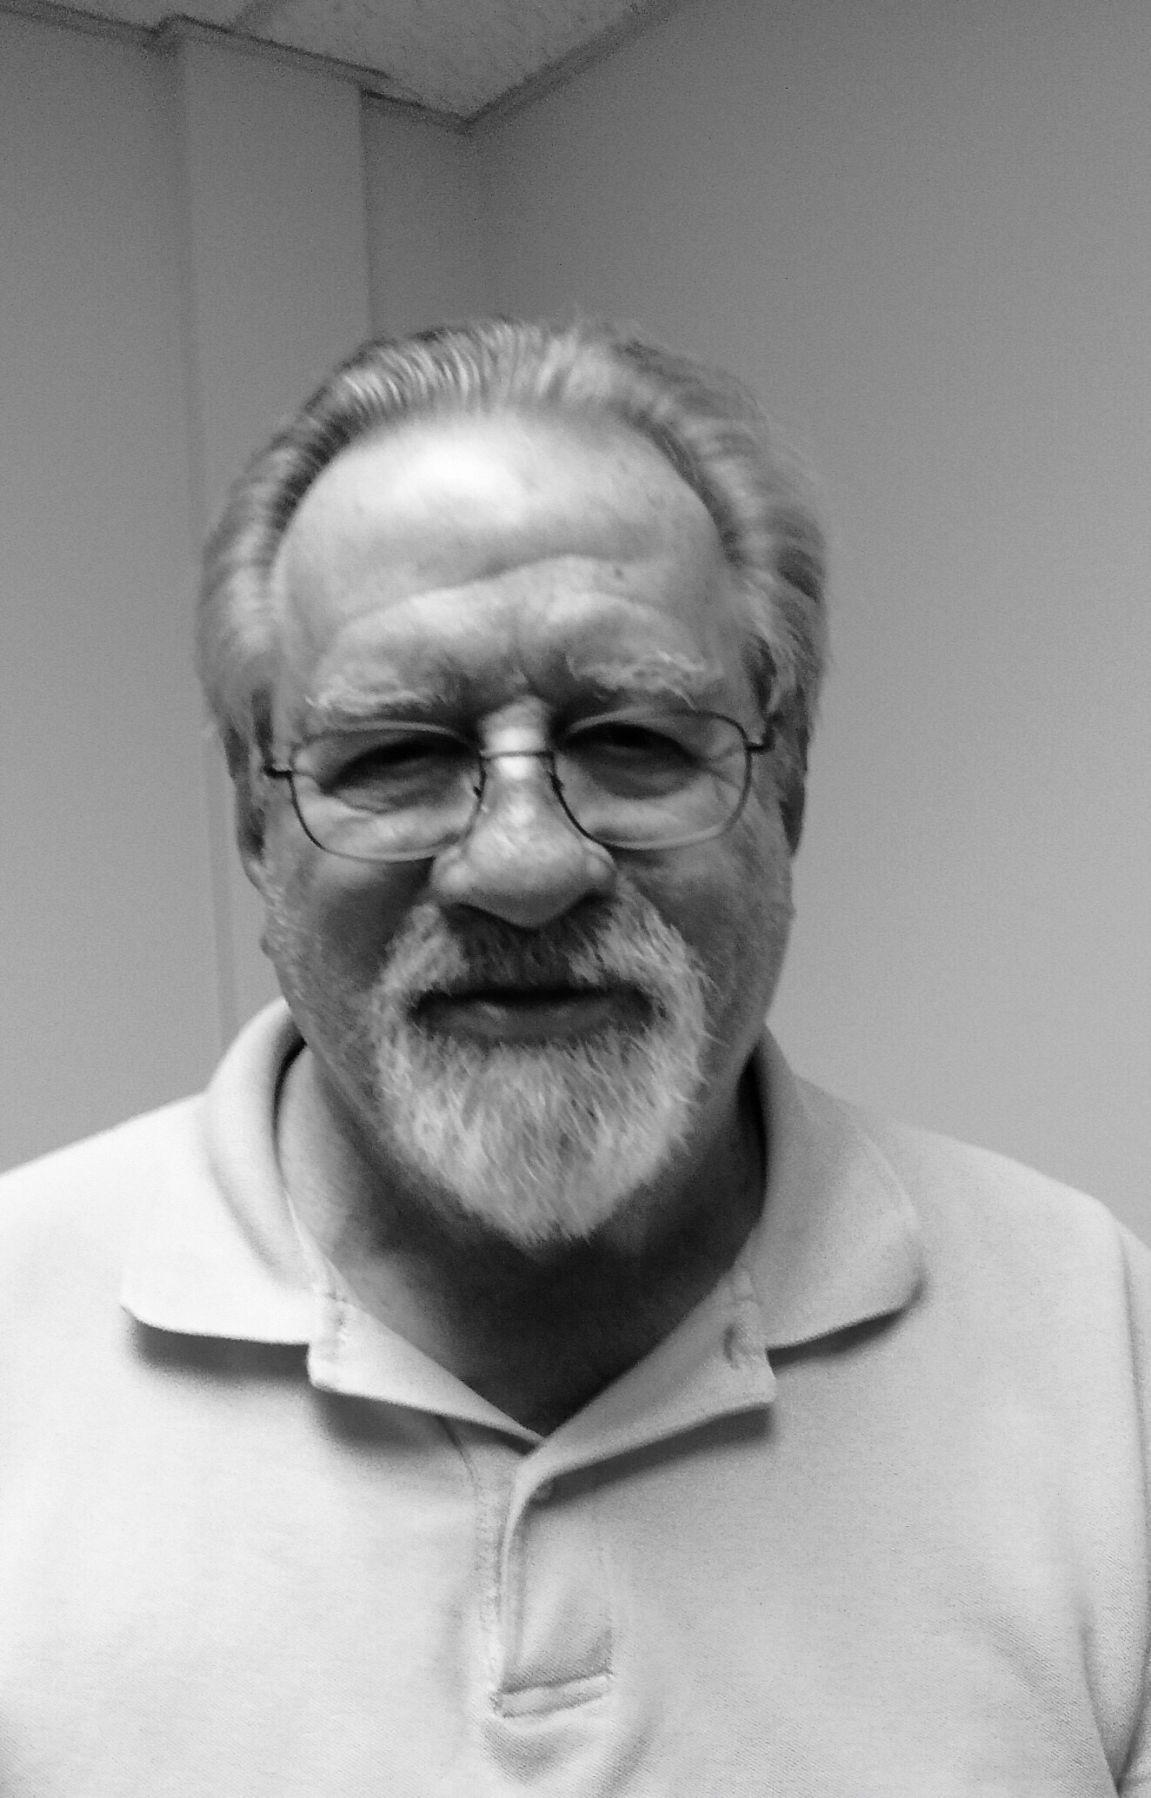 David Braden McCracken